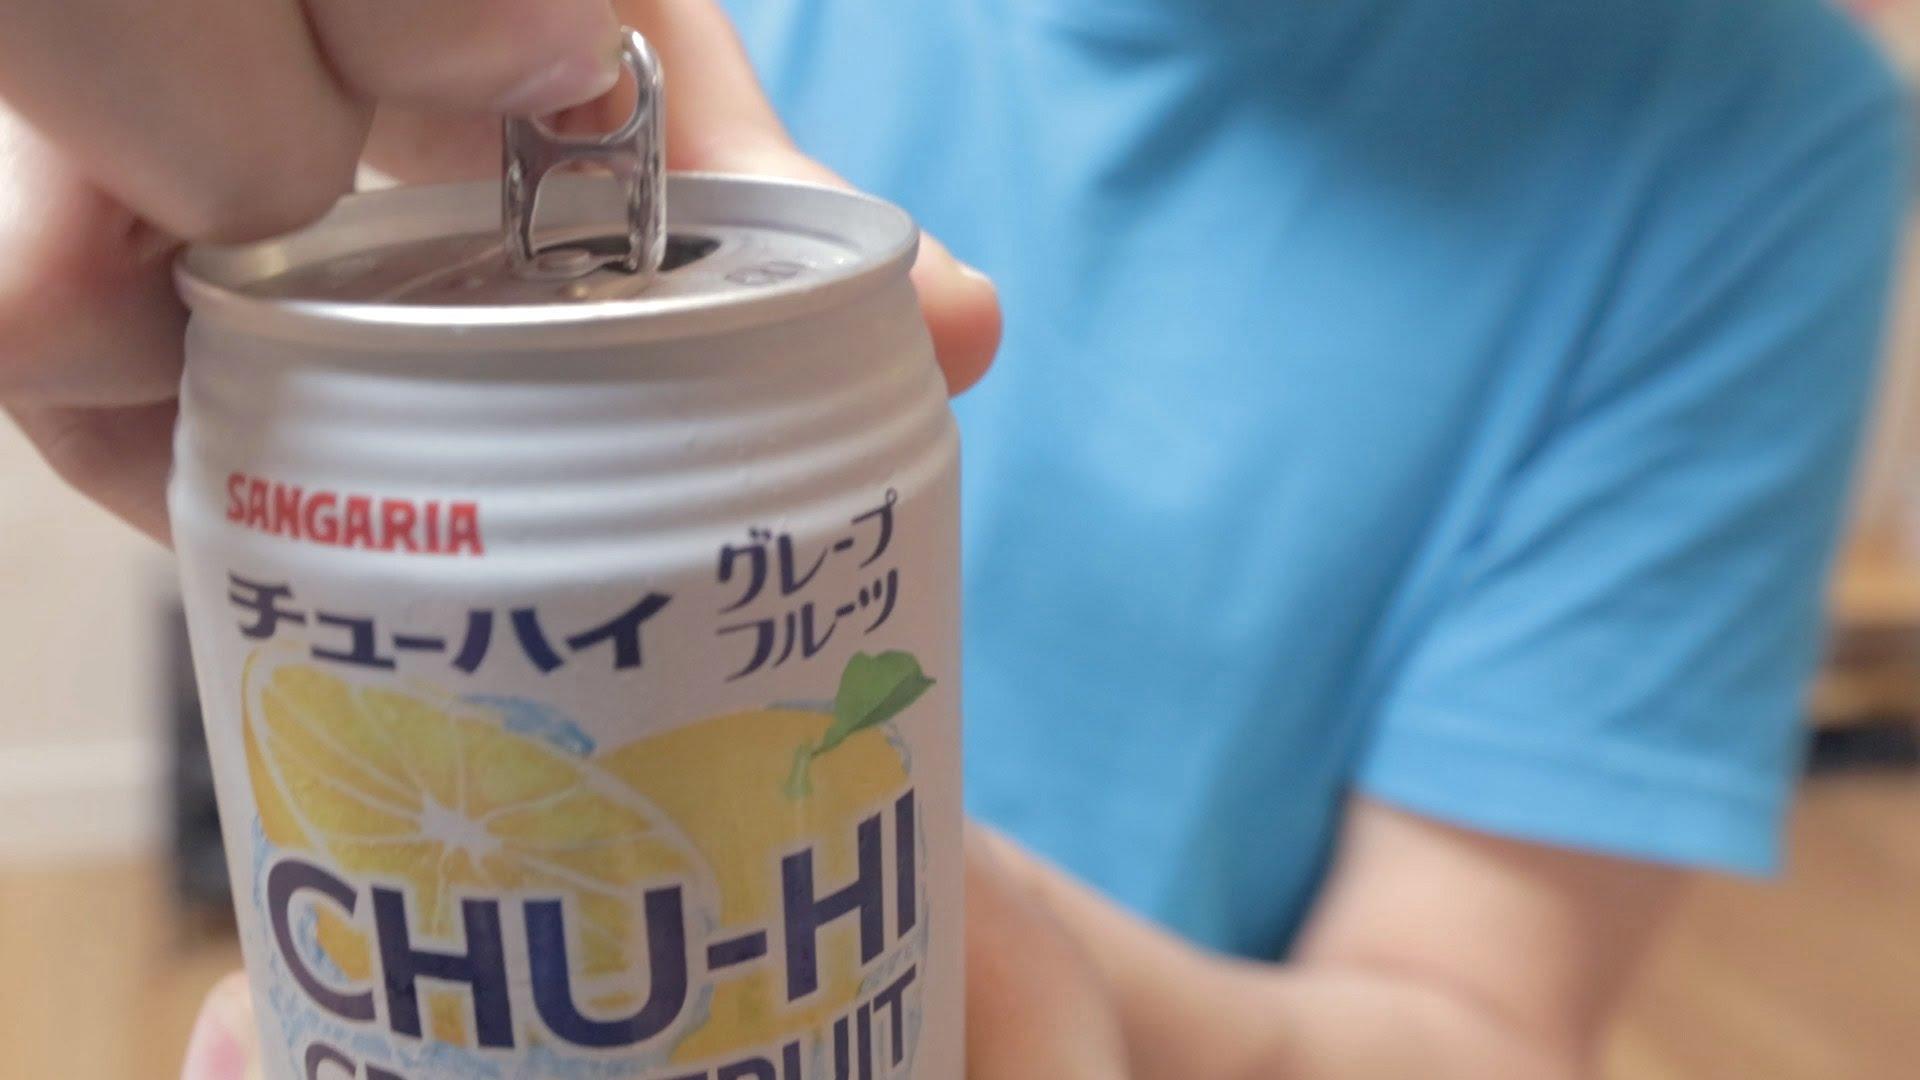 Chu-hi